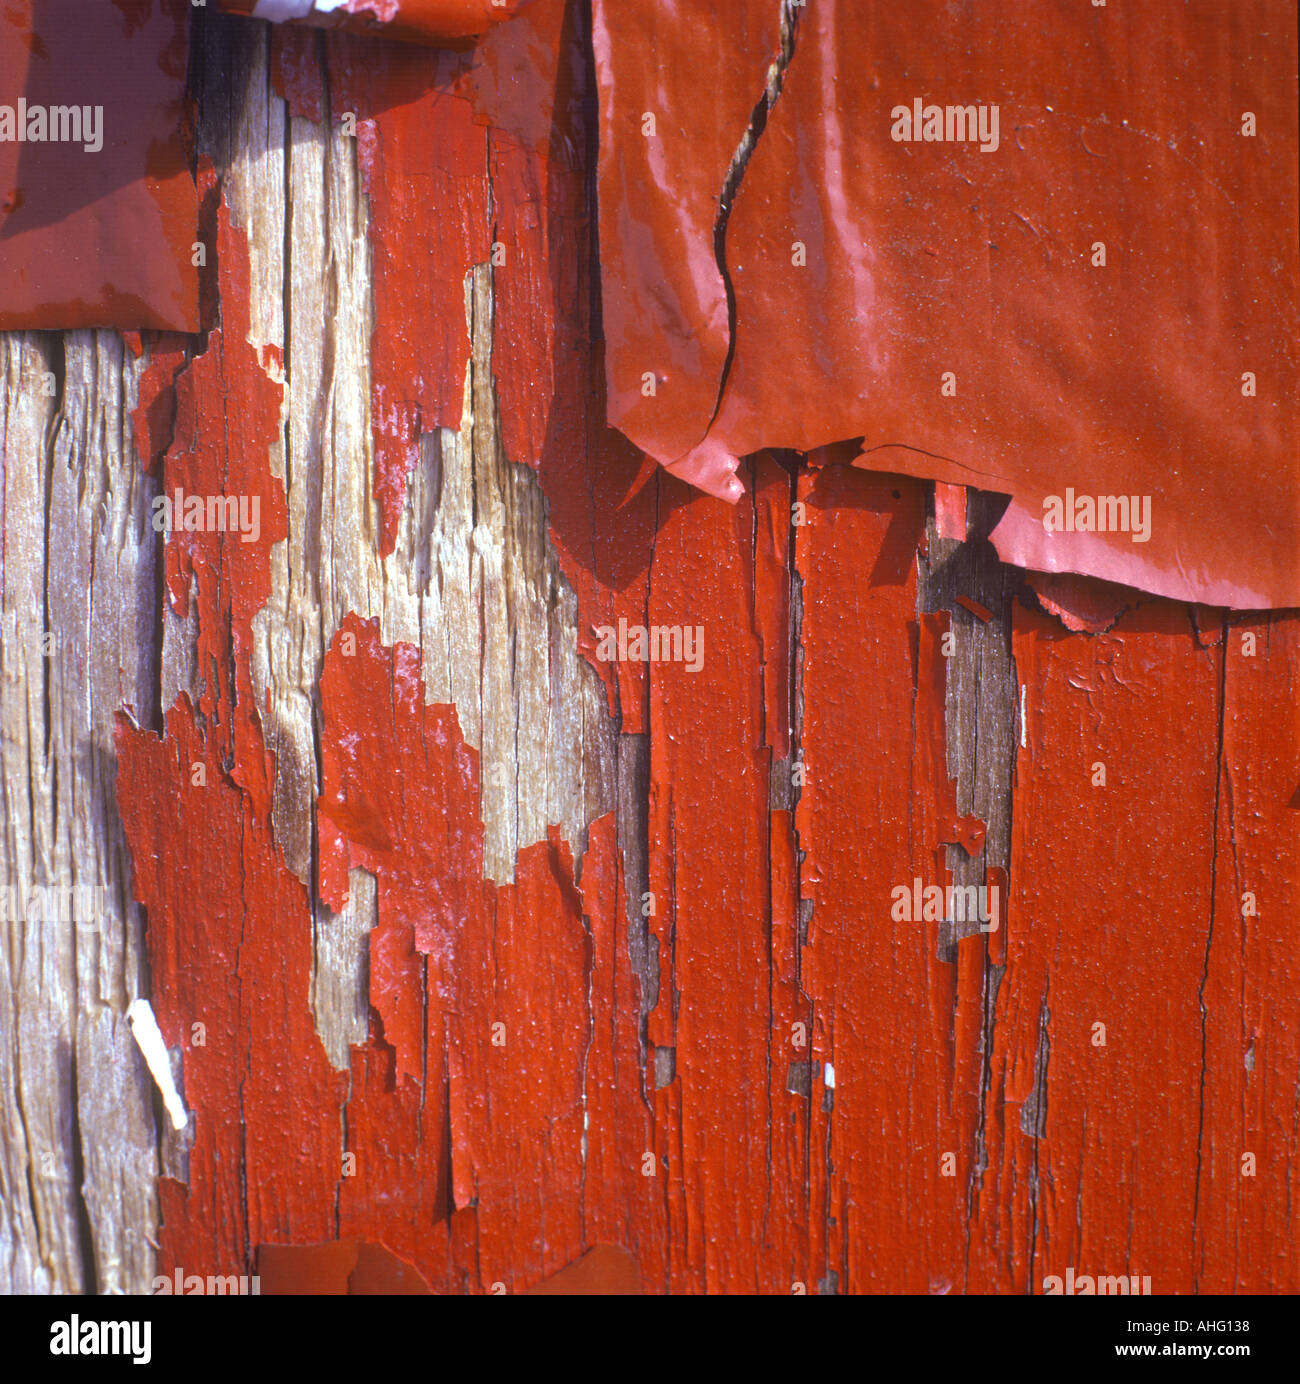 Peeling Paint Texture - Stock Image